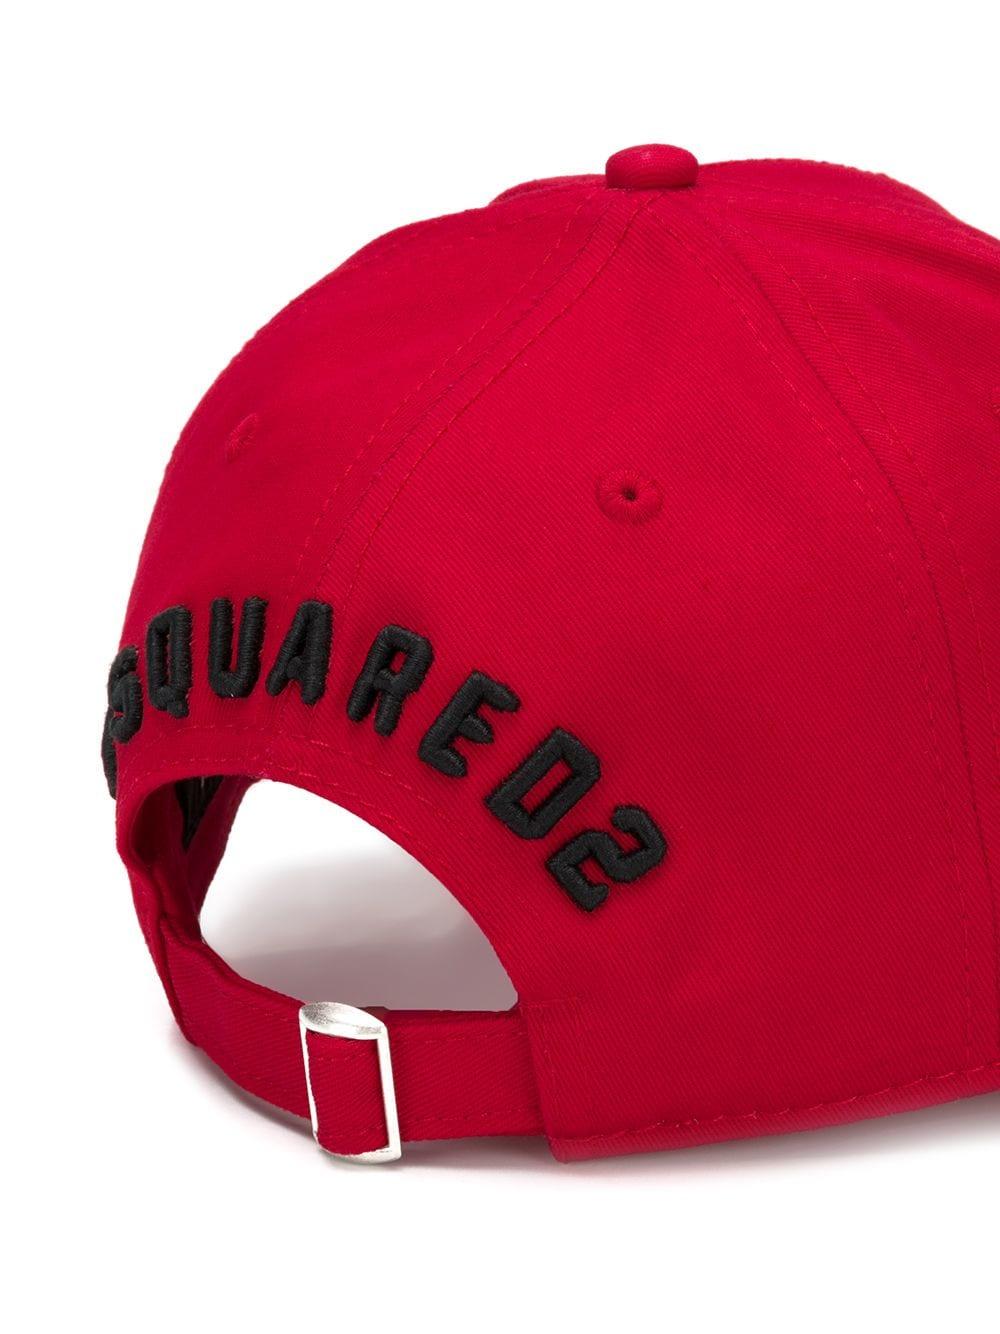 c92b3d4d Red Baseball Cap With Black Icon Logo - DSQUARED2 - Russocapri